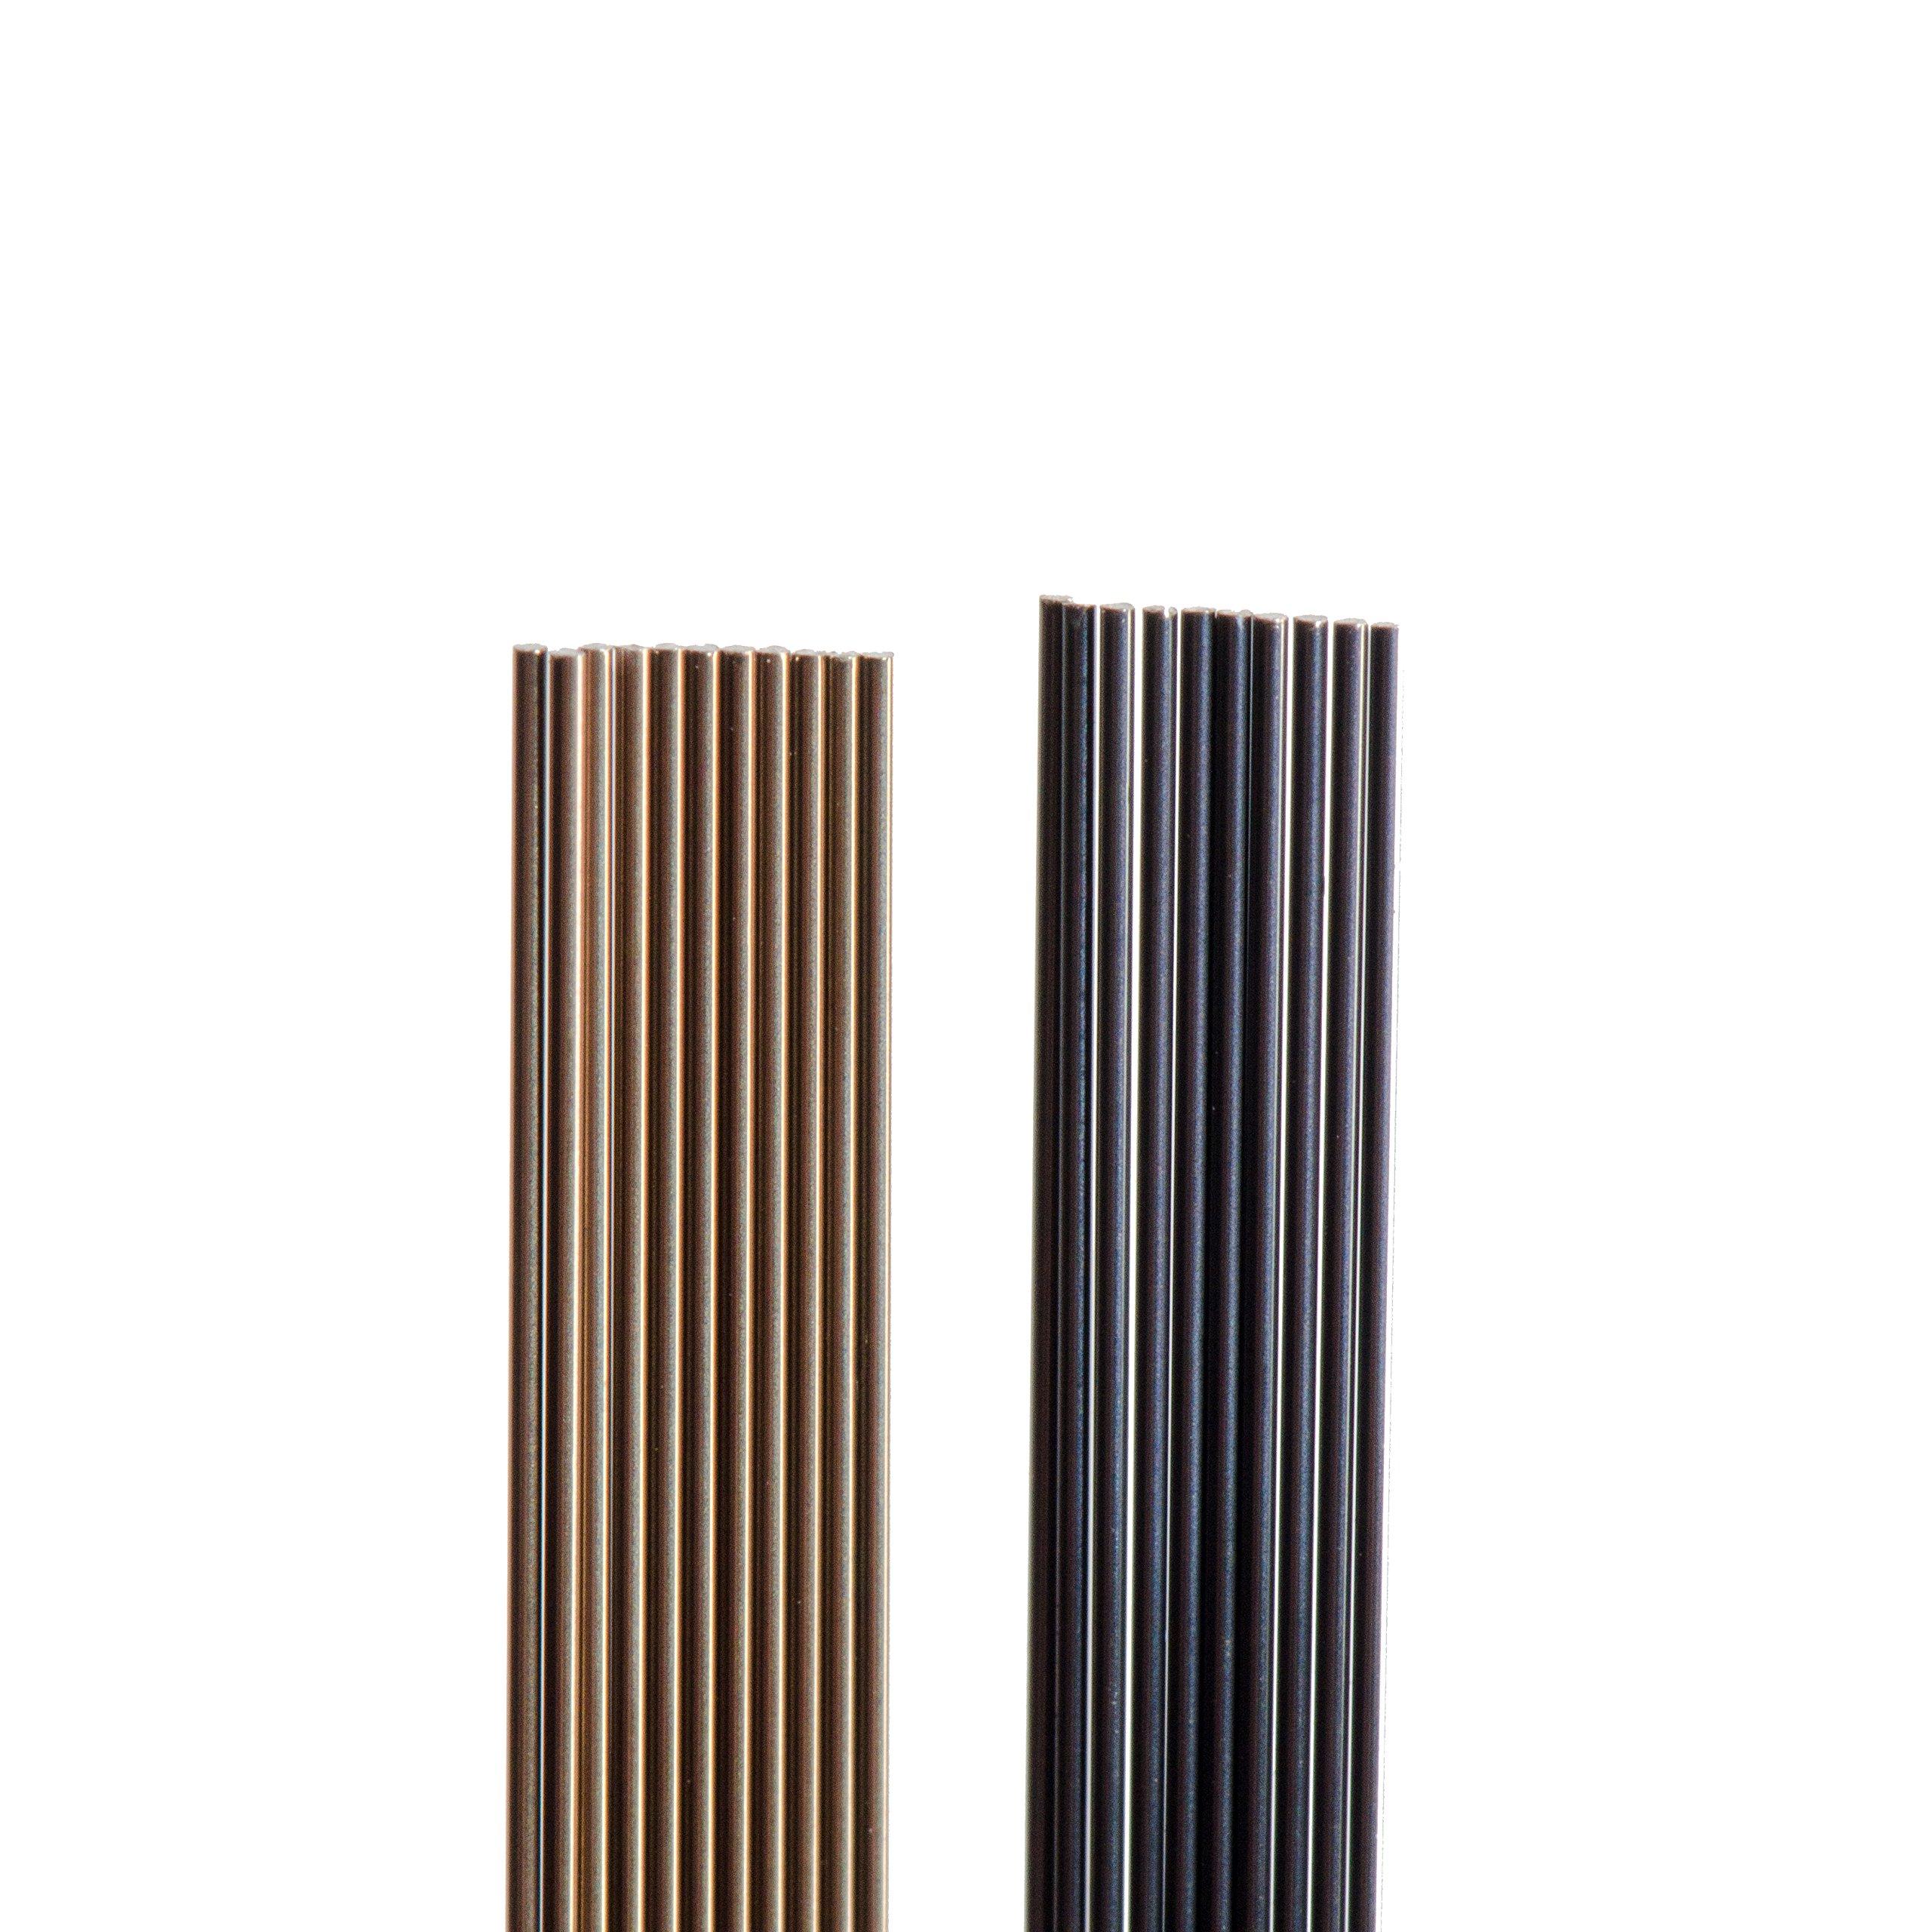 Nitinol #1 Wire, Oxide Finish, Super Elastic